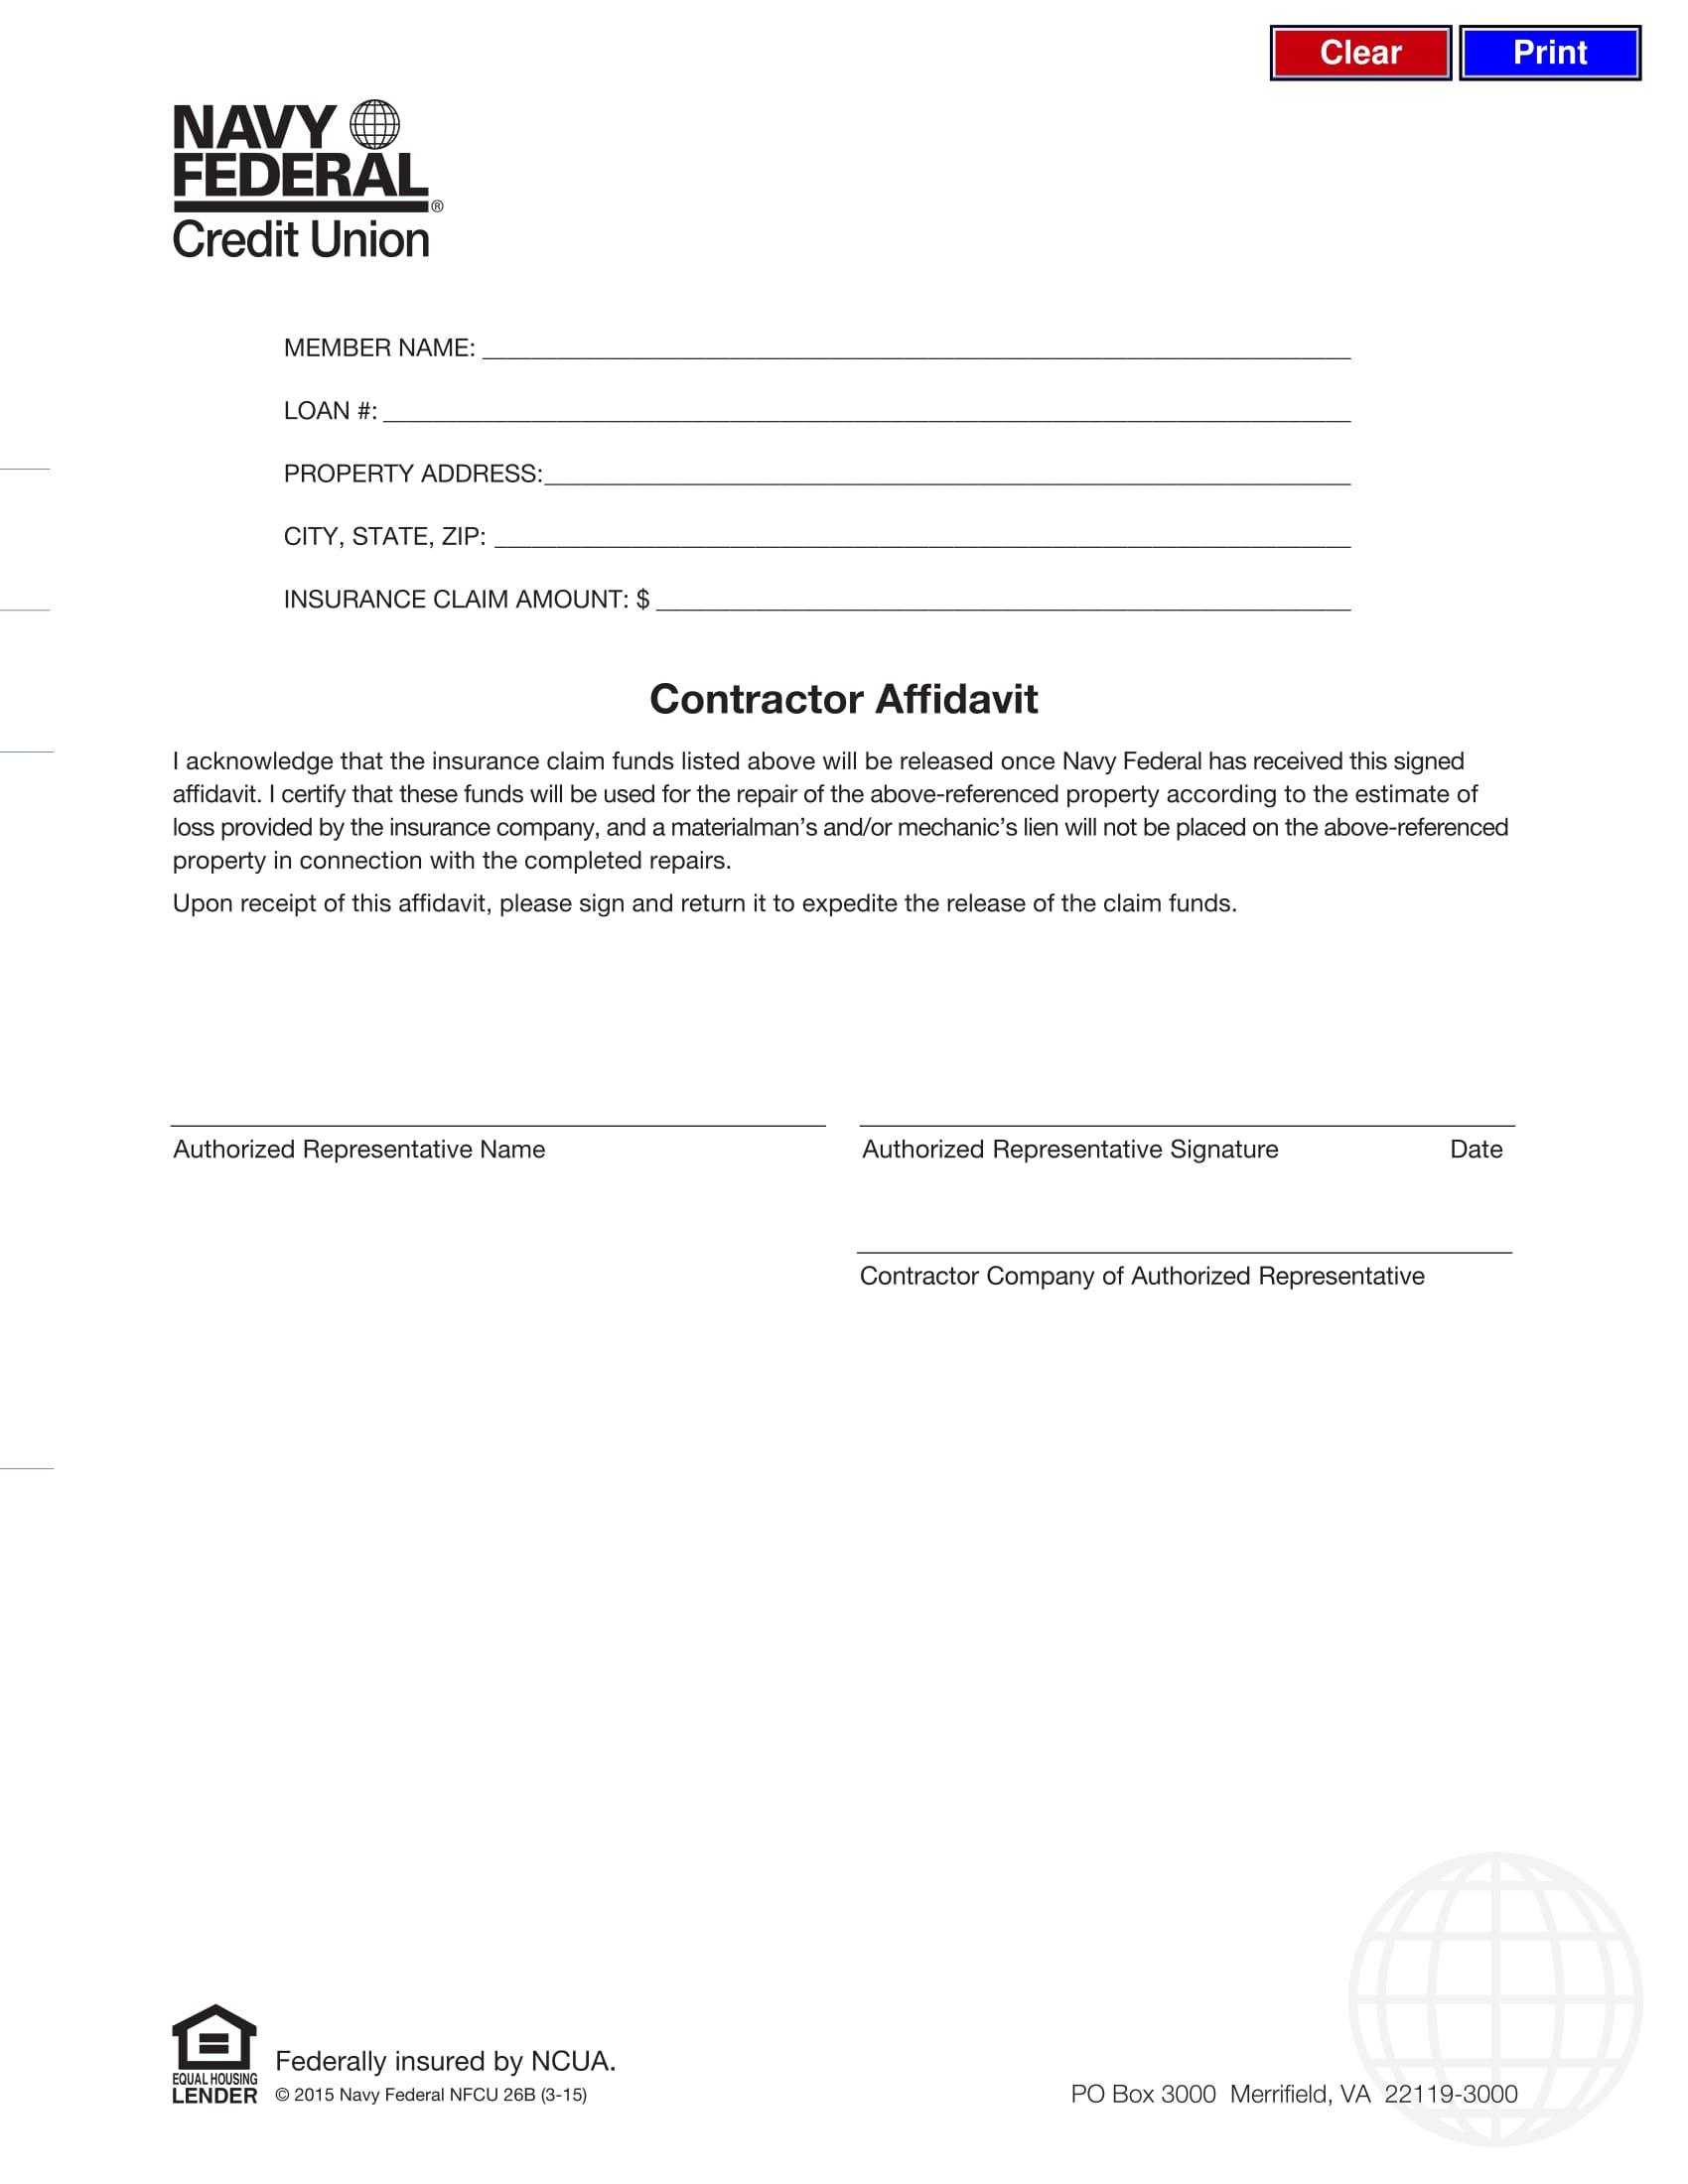 19 Free Affidavit Forms